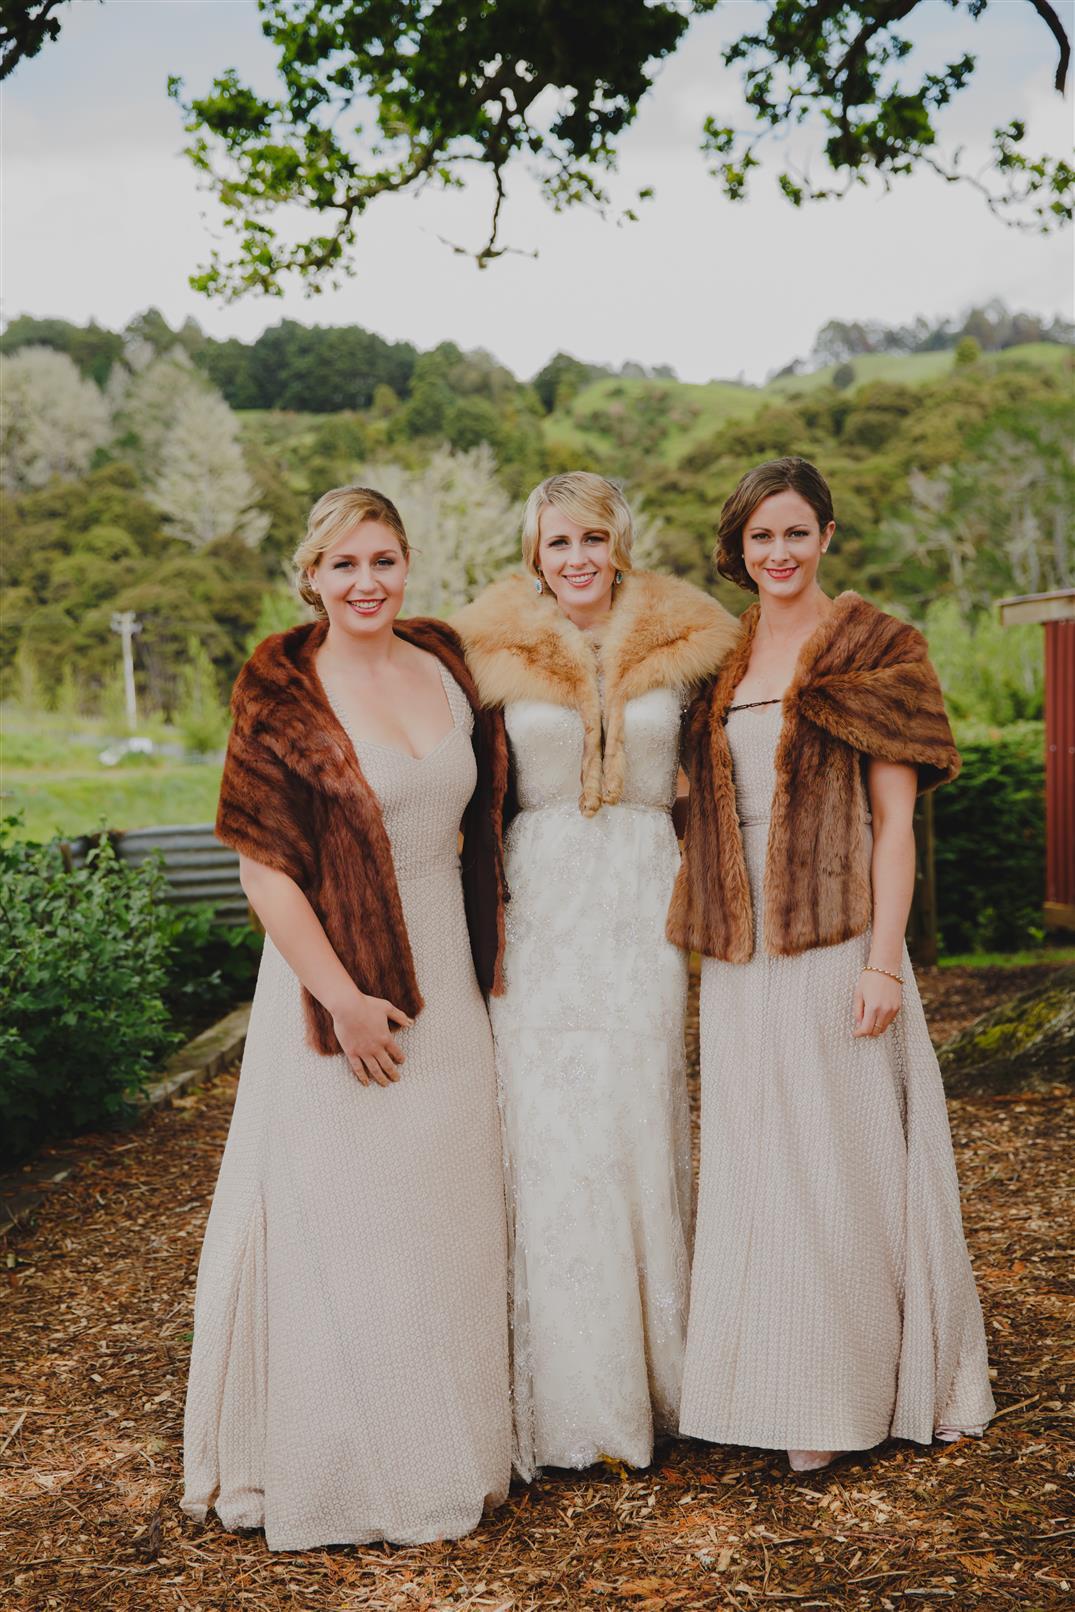 Elegant Vintage Bridesmaids - An Elegant Modern Vintage Spring Wedding